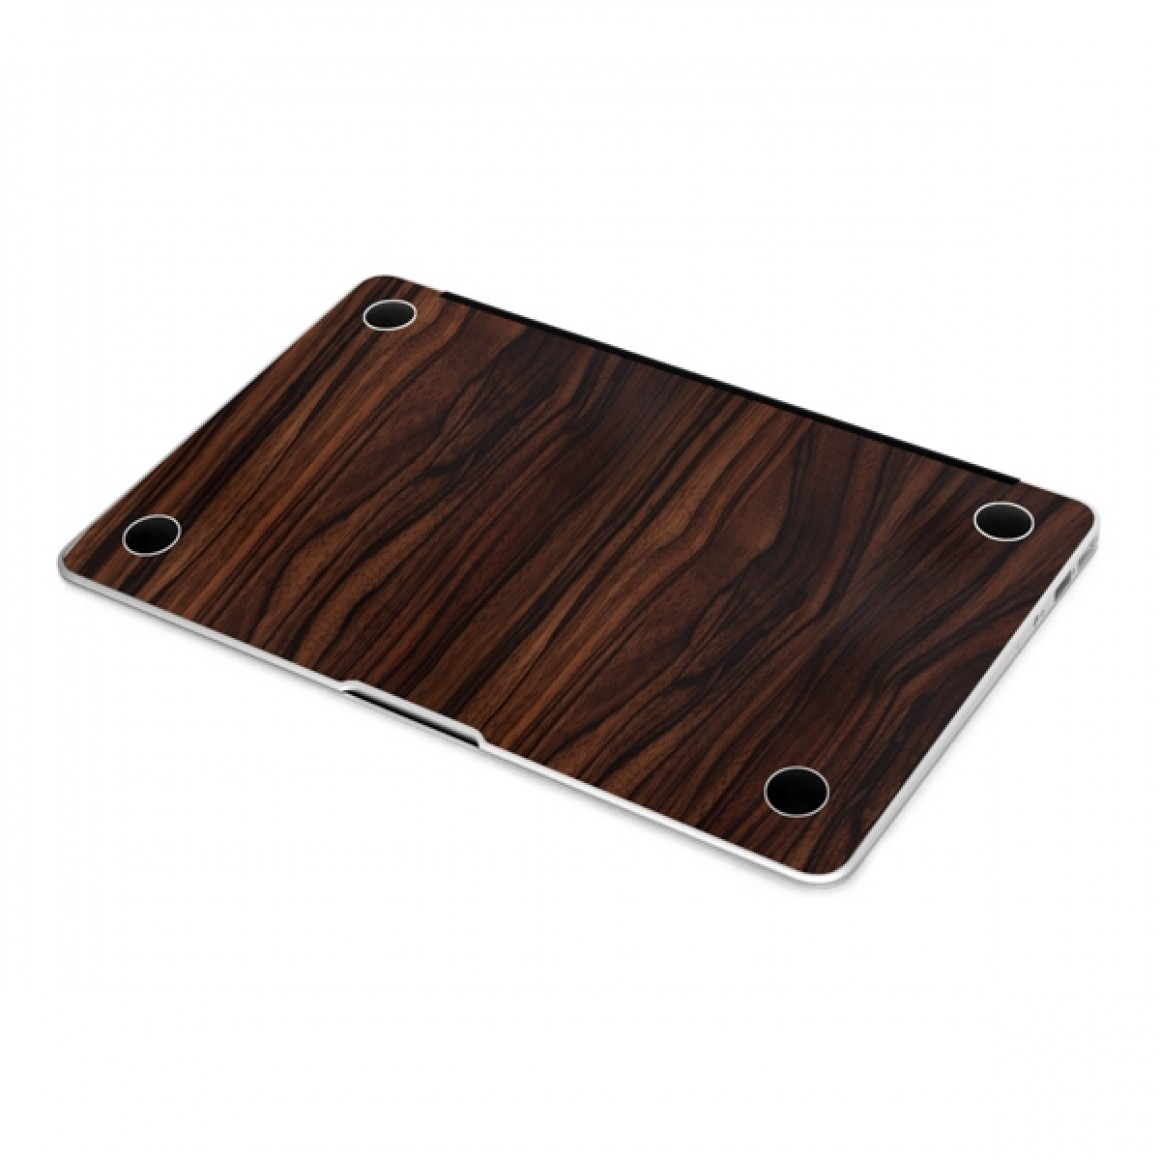 Adesivo Skin Premium Estampa madeira para Macbook Pro 13 A1278